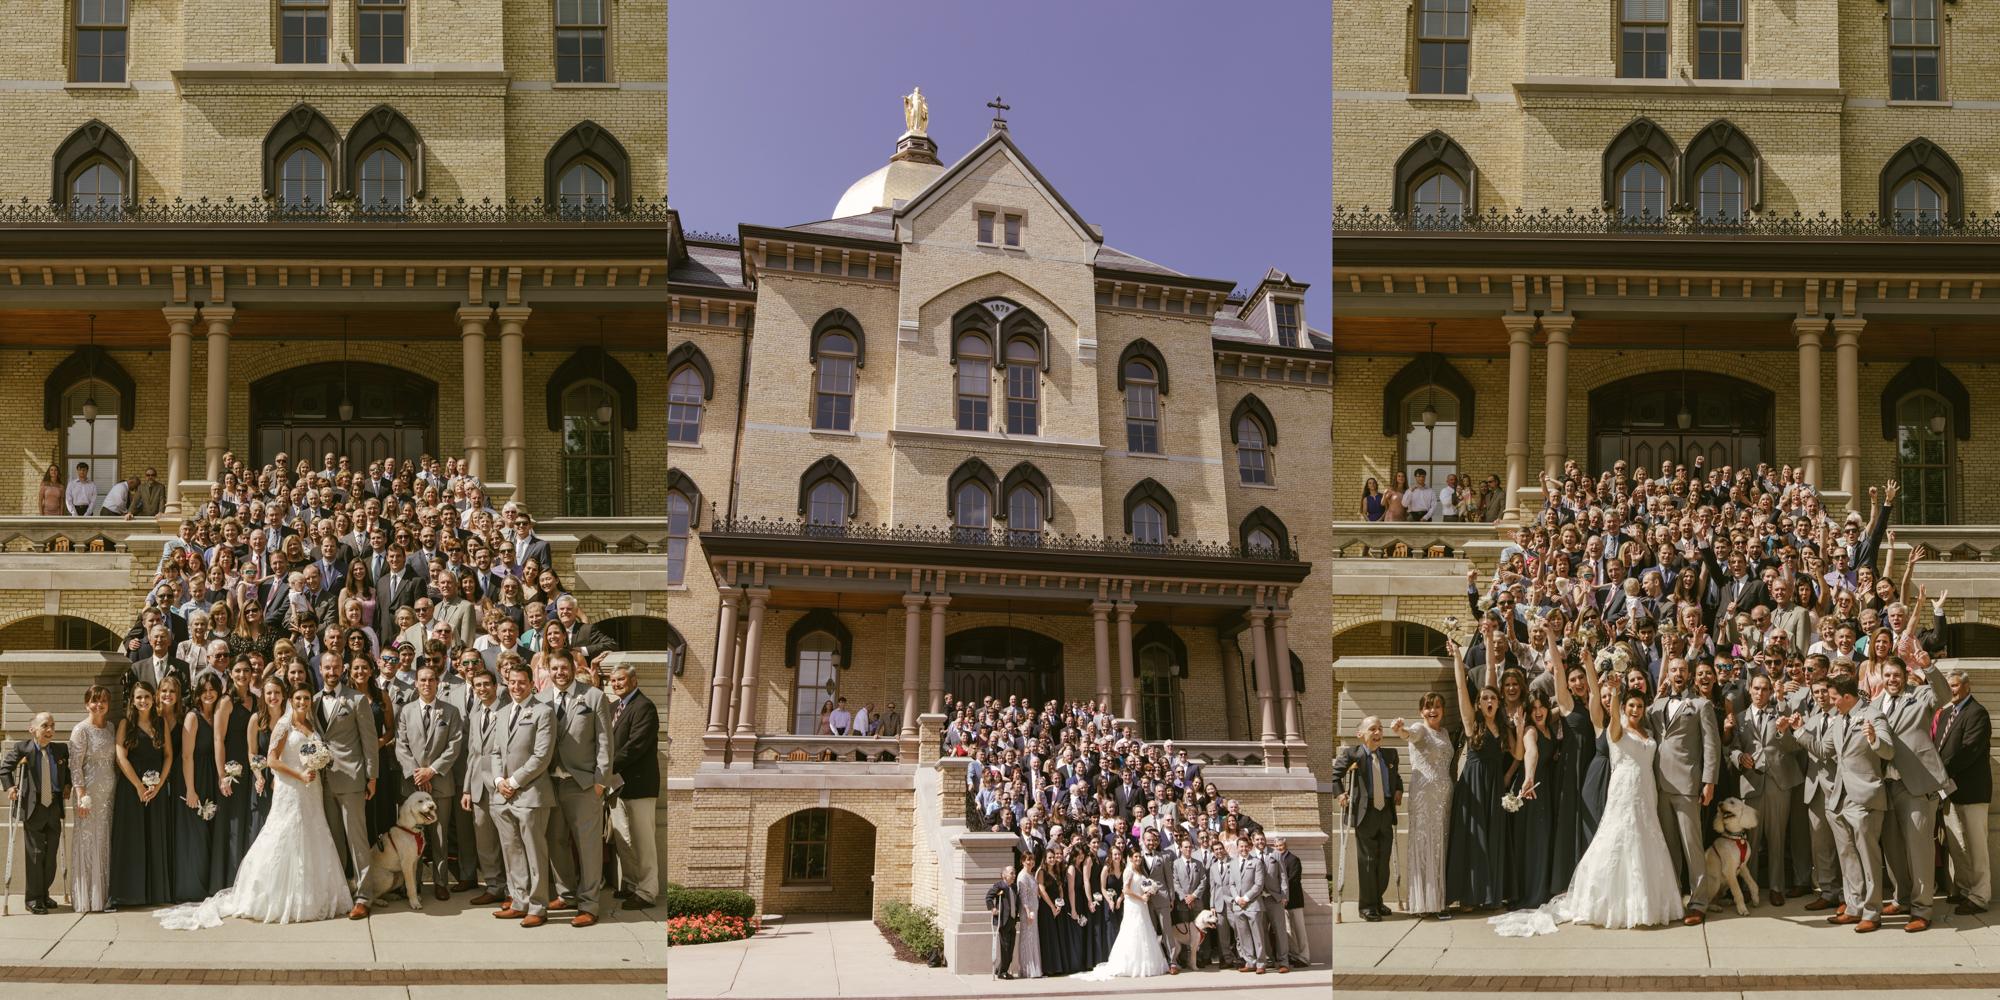 015 kaitlyn-colin-notre-dame-wedding.jpg